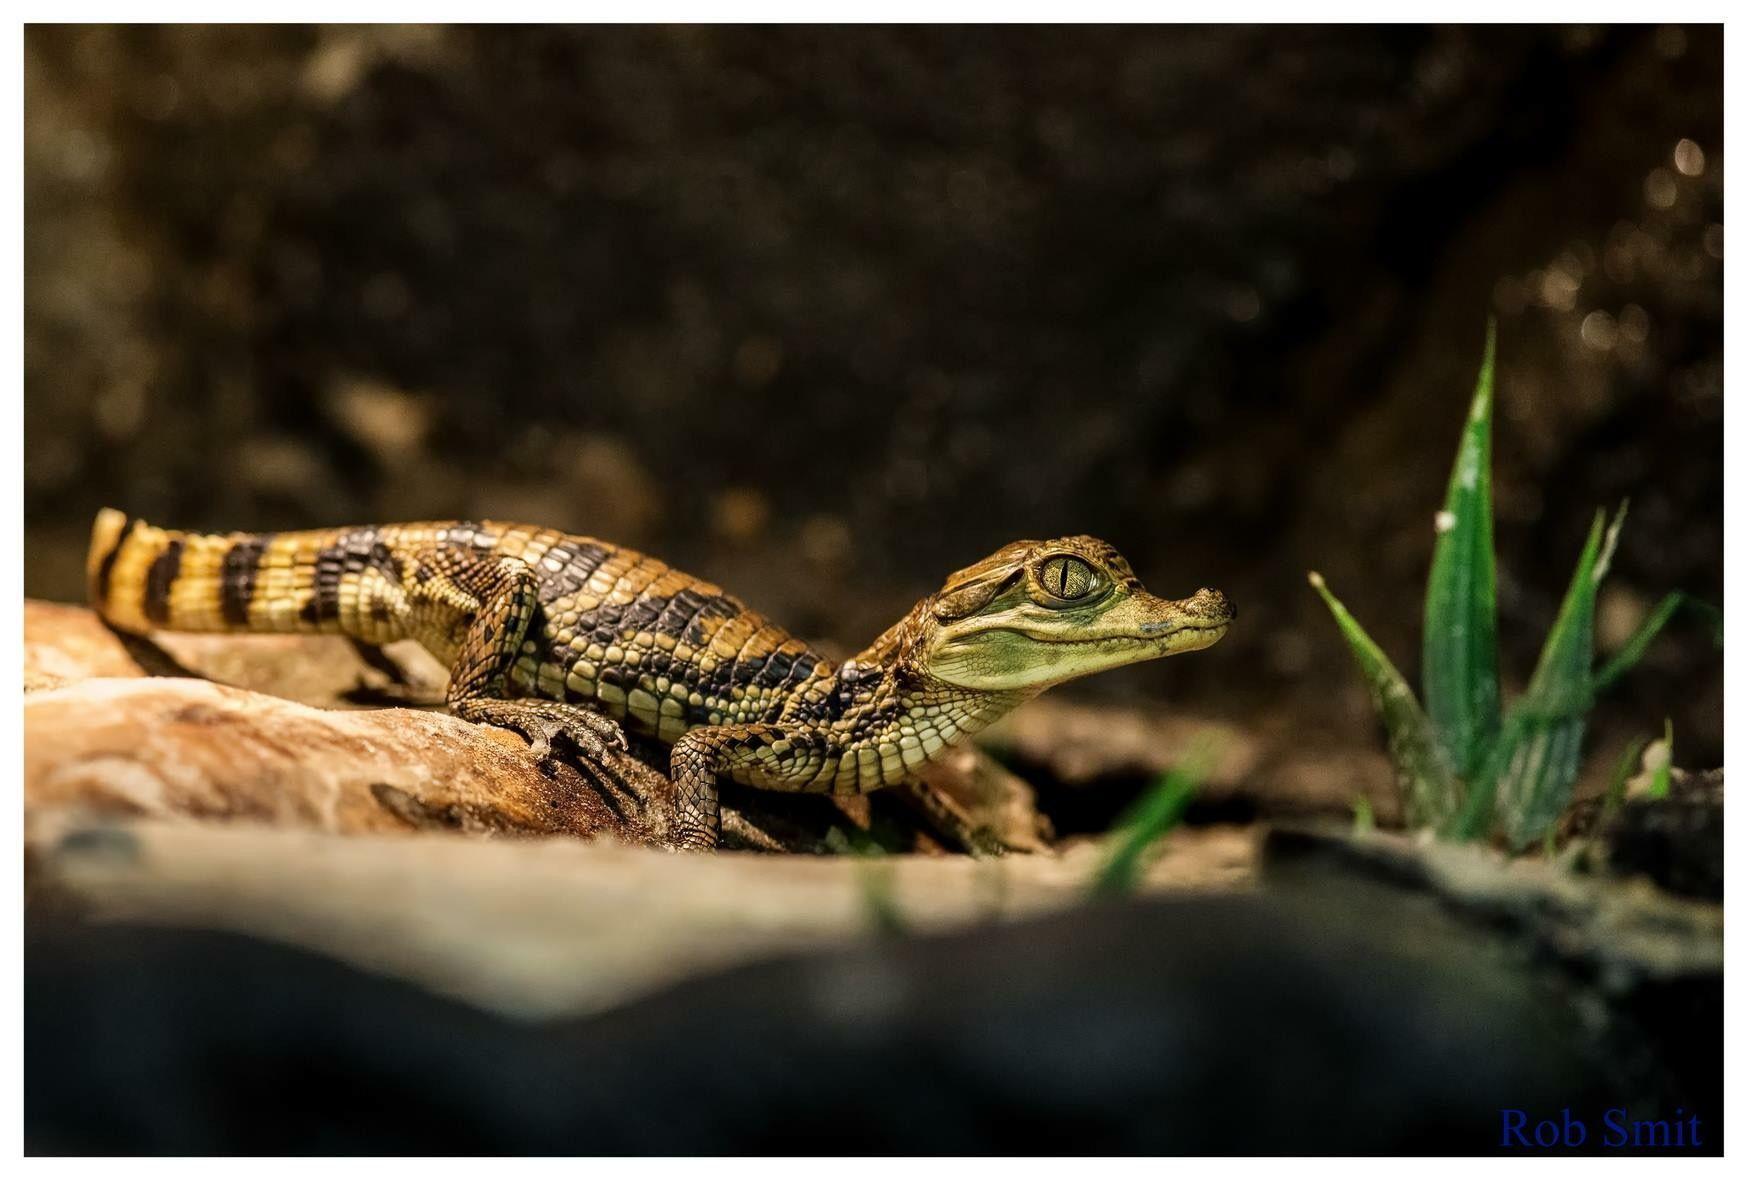 cfddefc8c870 Caiman crocodillus 22cm 60 gram 4 weeks old  www.facebook.com freezefotografie